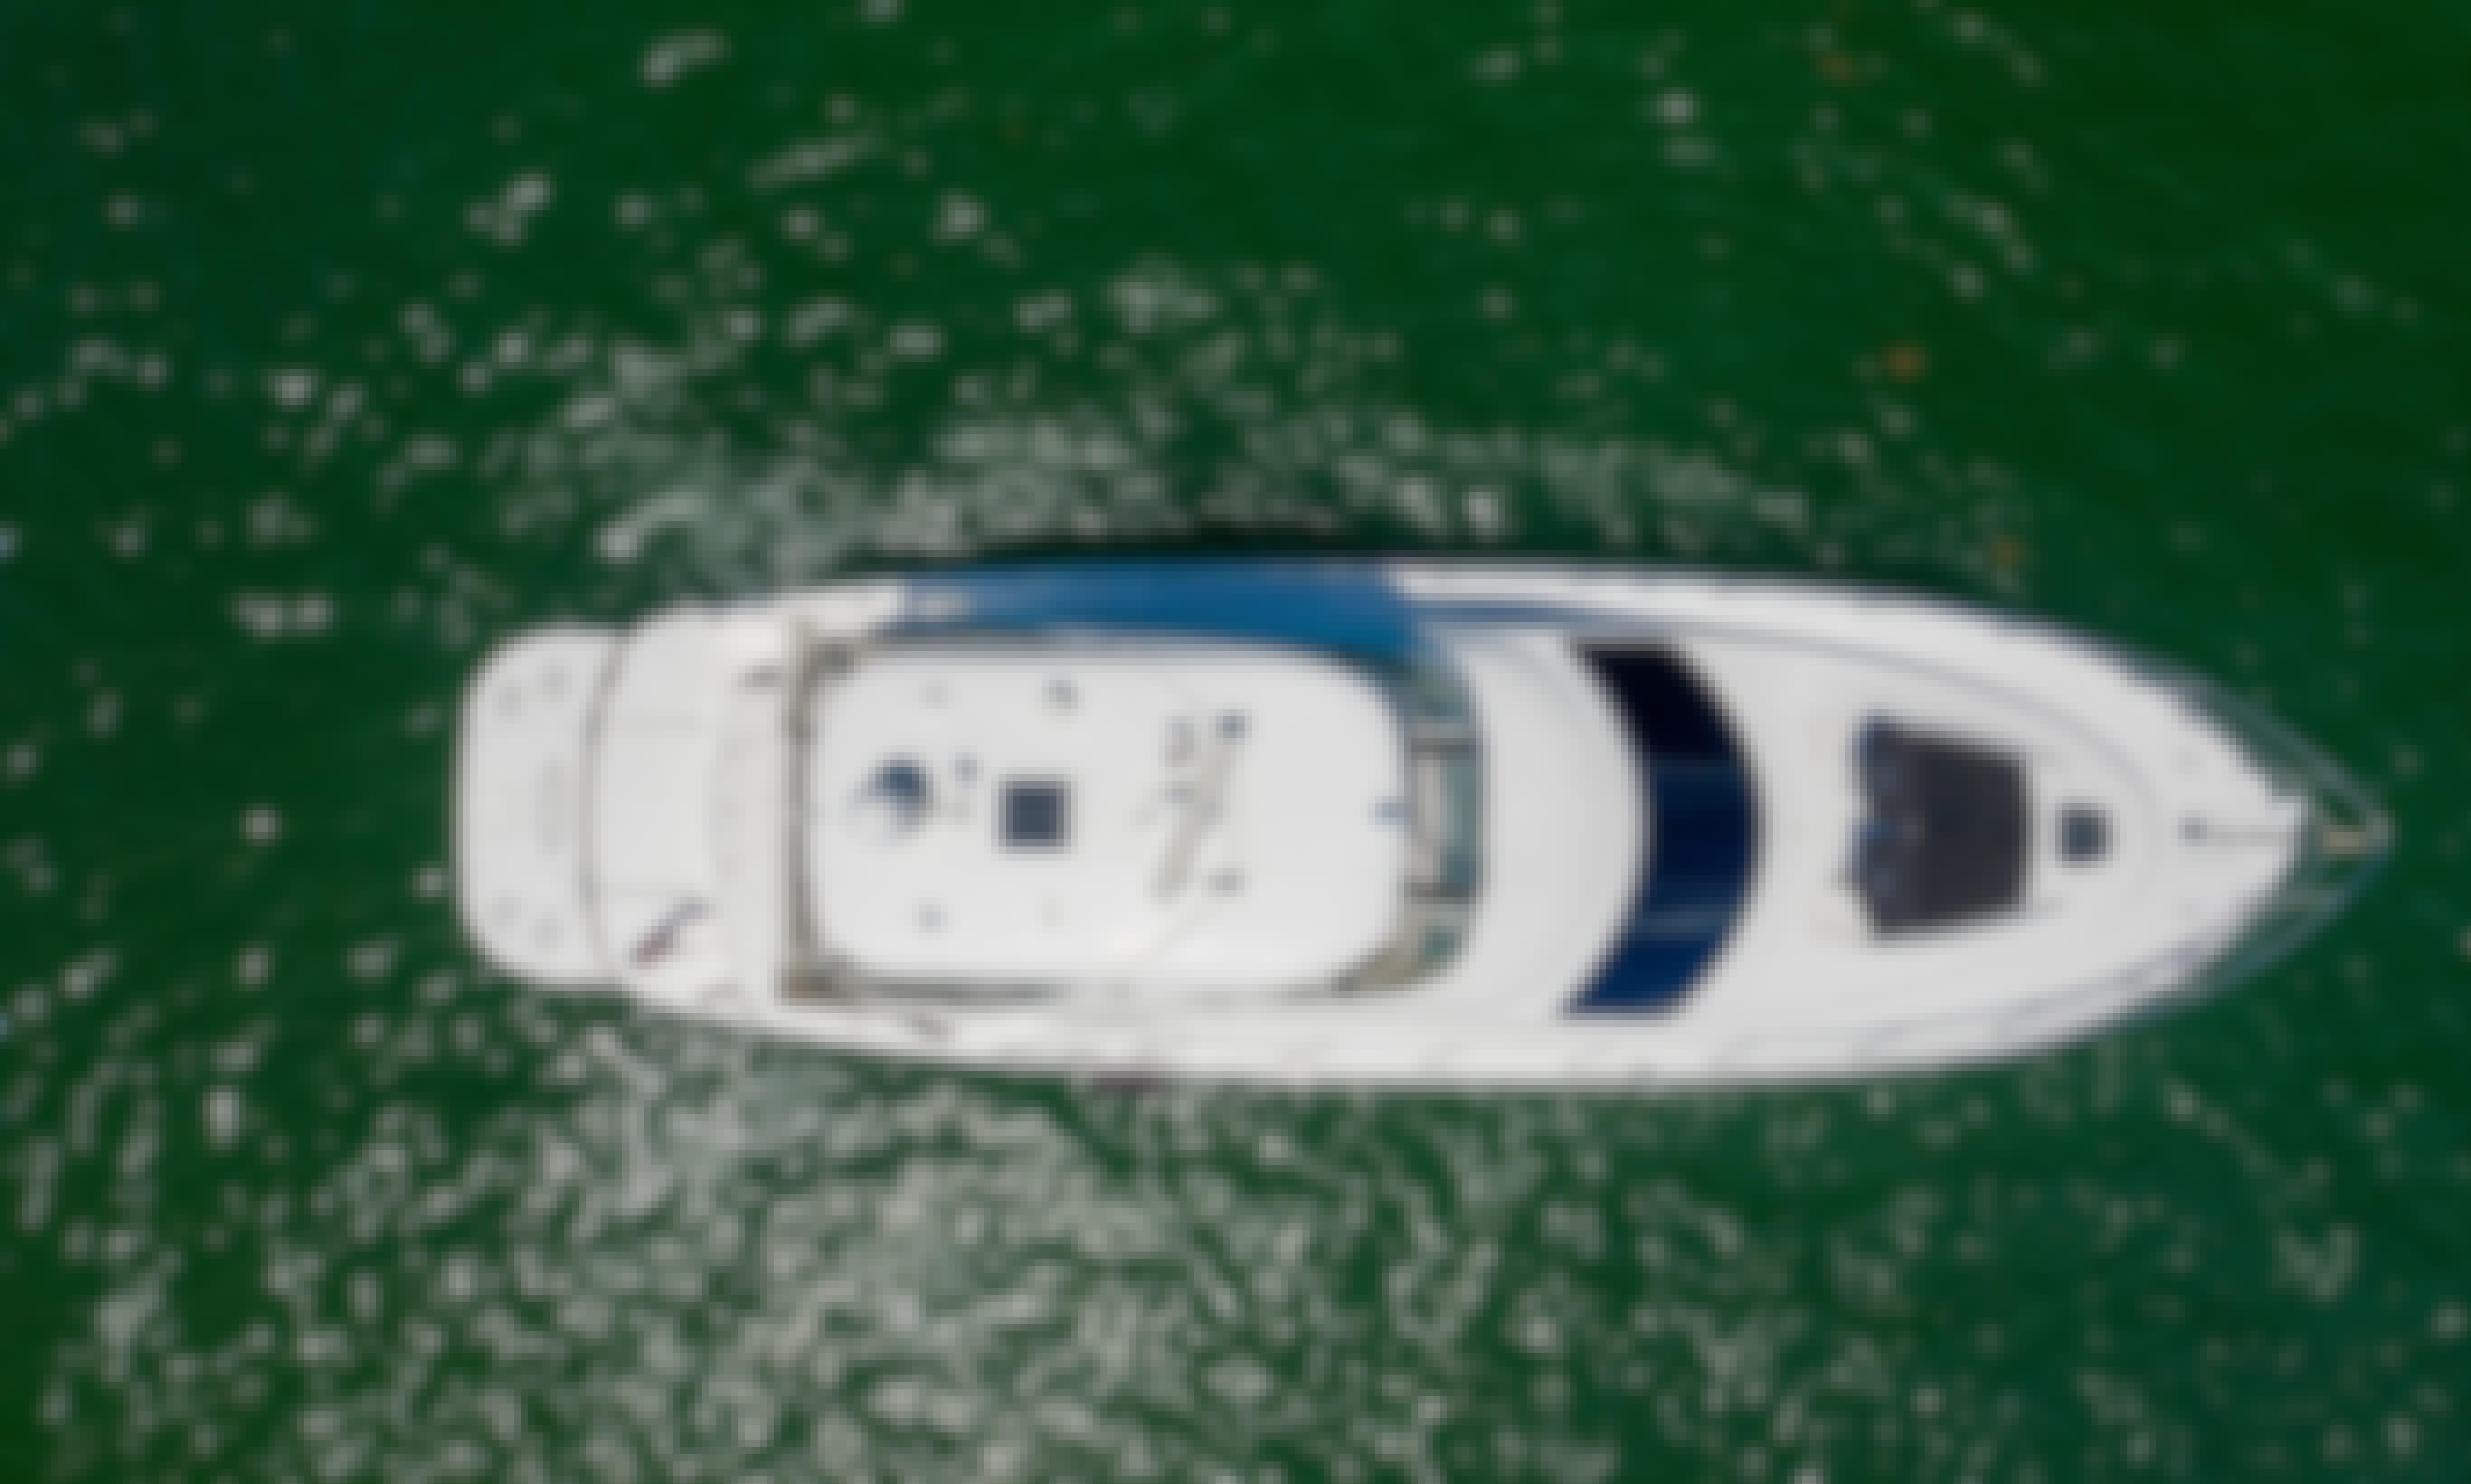 56' Searay Flybridge!! $10k Sound System. Party Yacht!!! Weekday